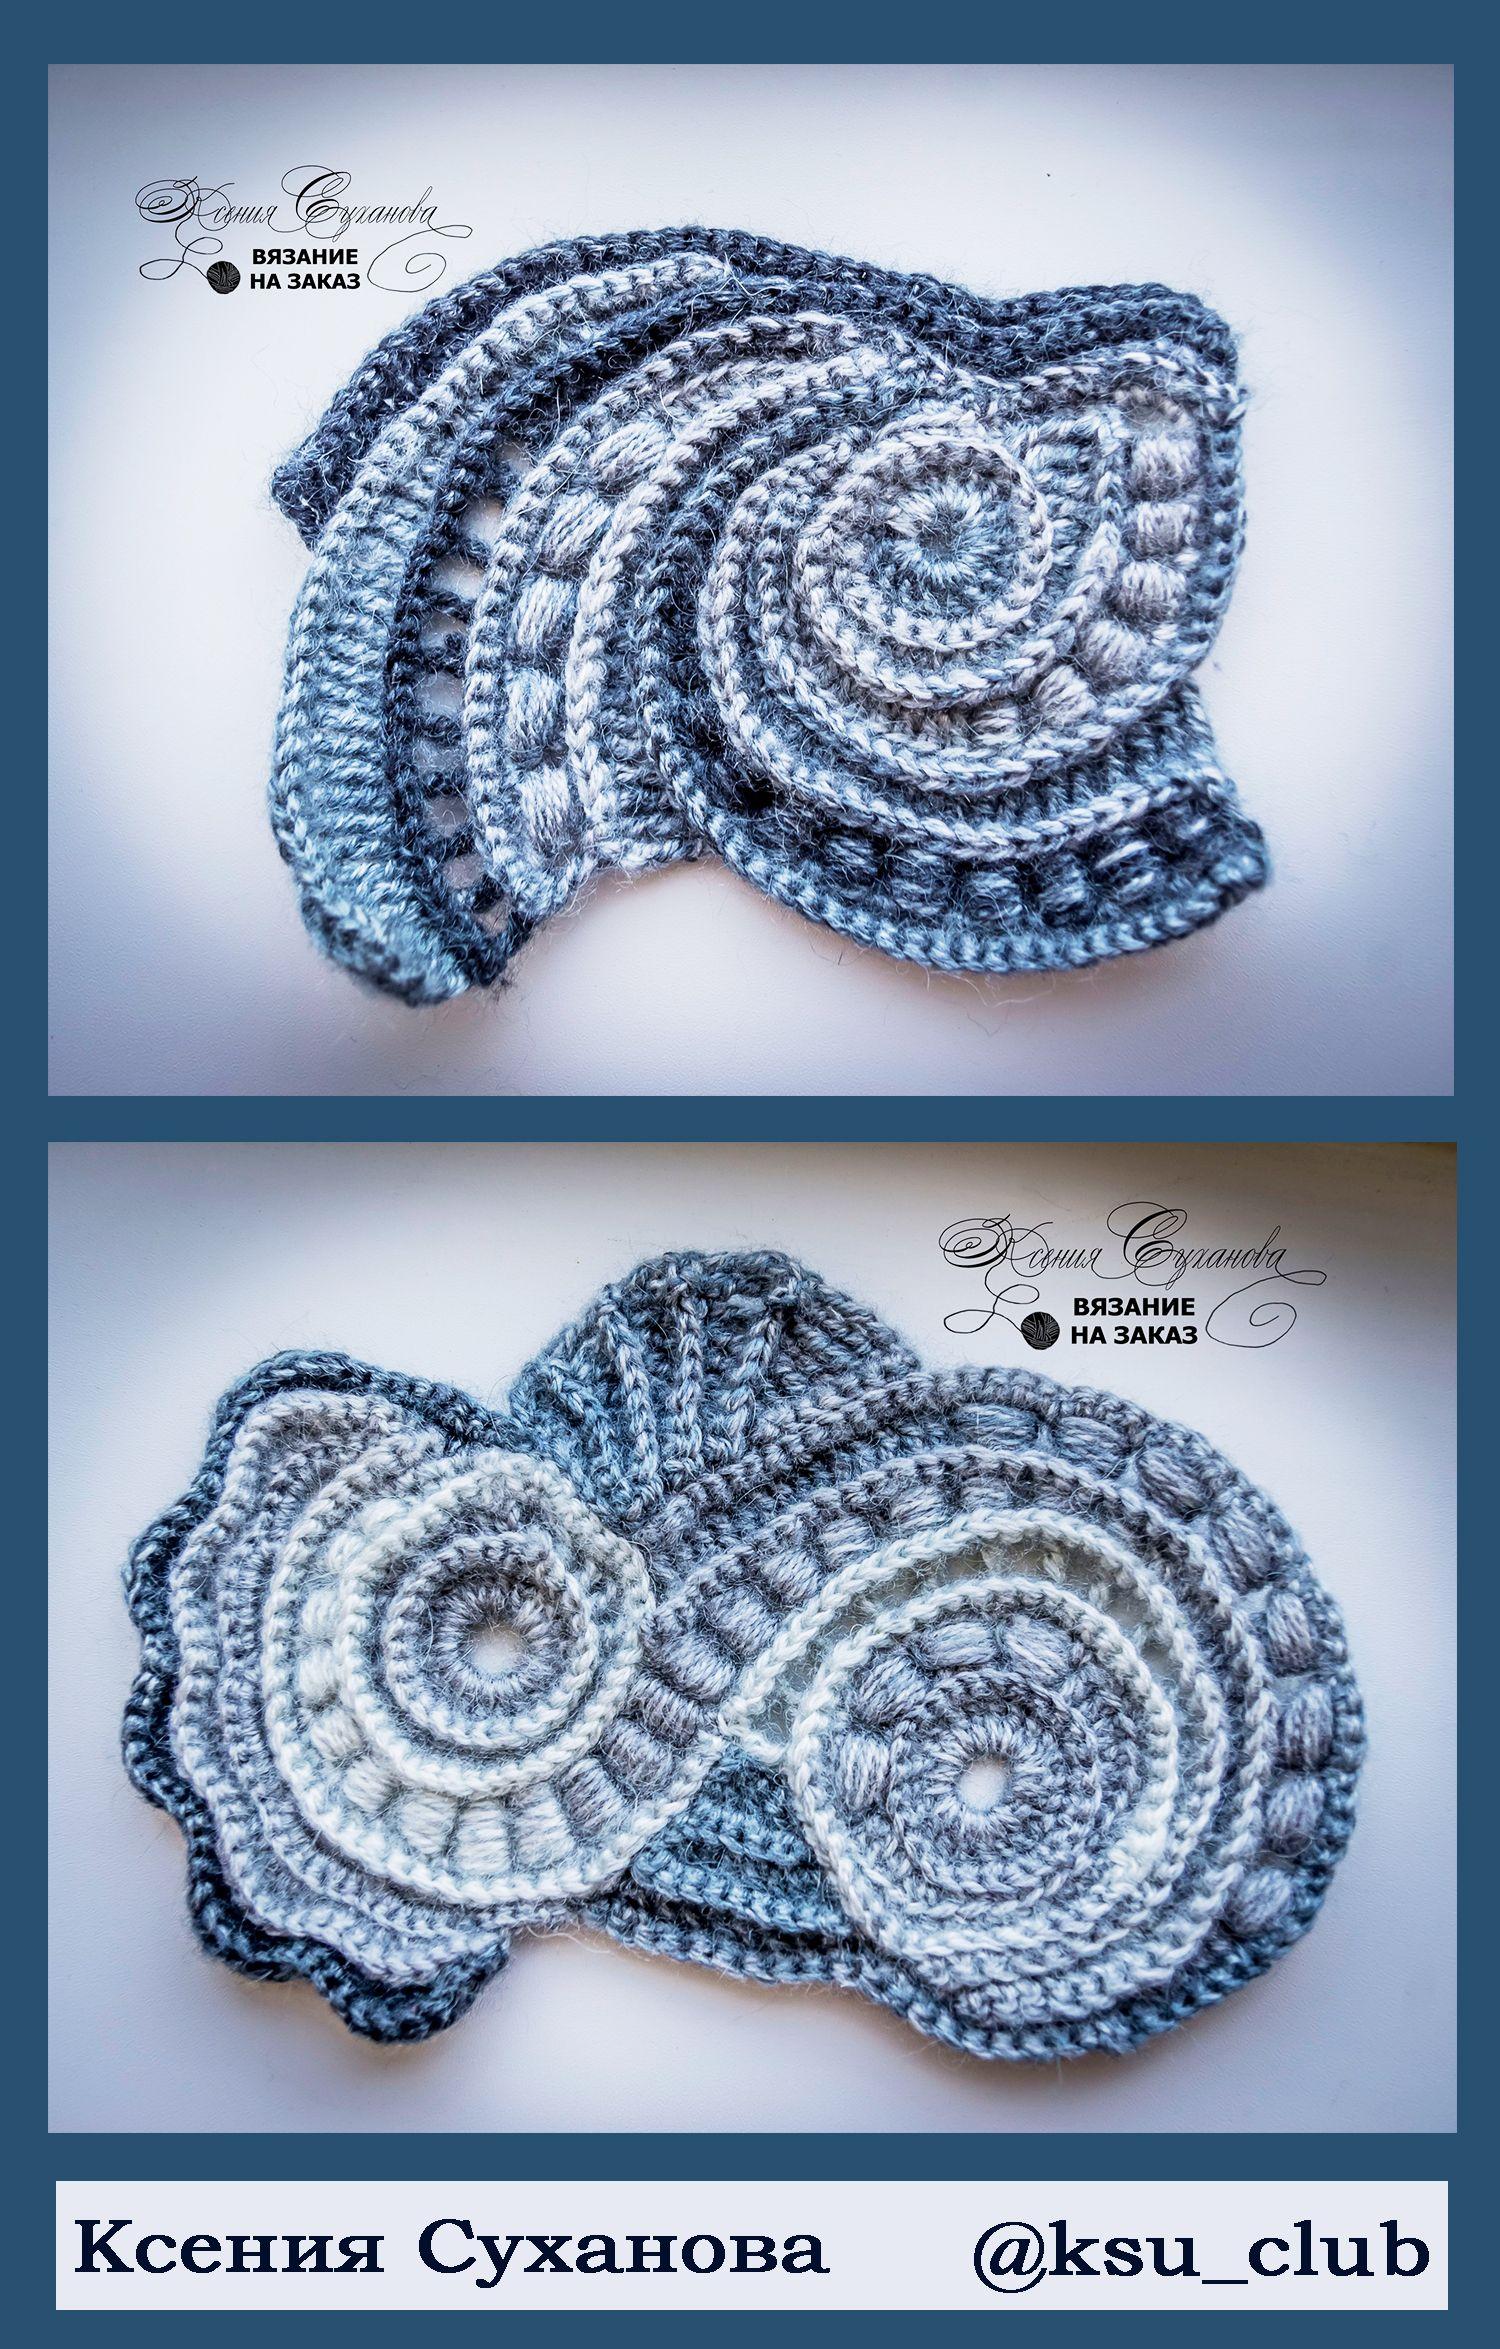 вязание крючком фриформ мастер класс вязание на заказ Crochet